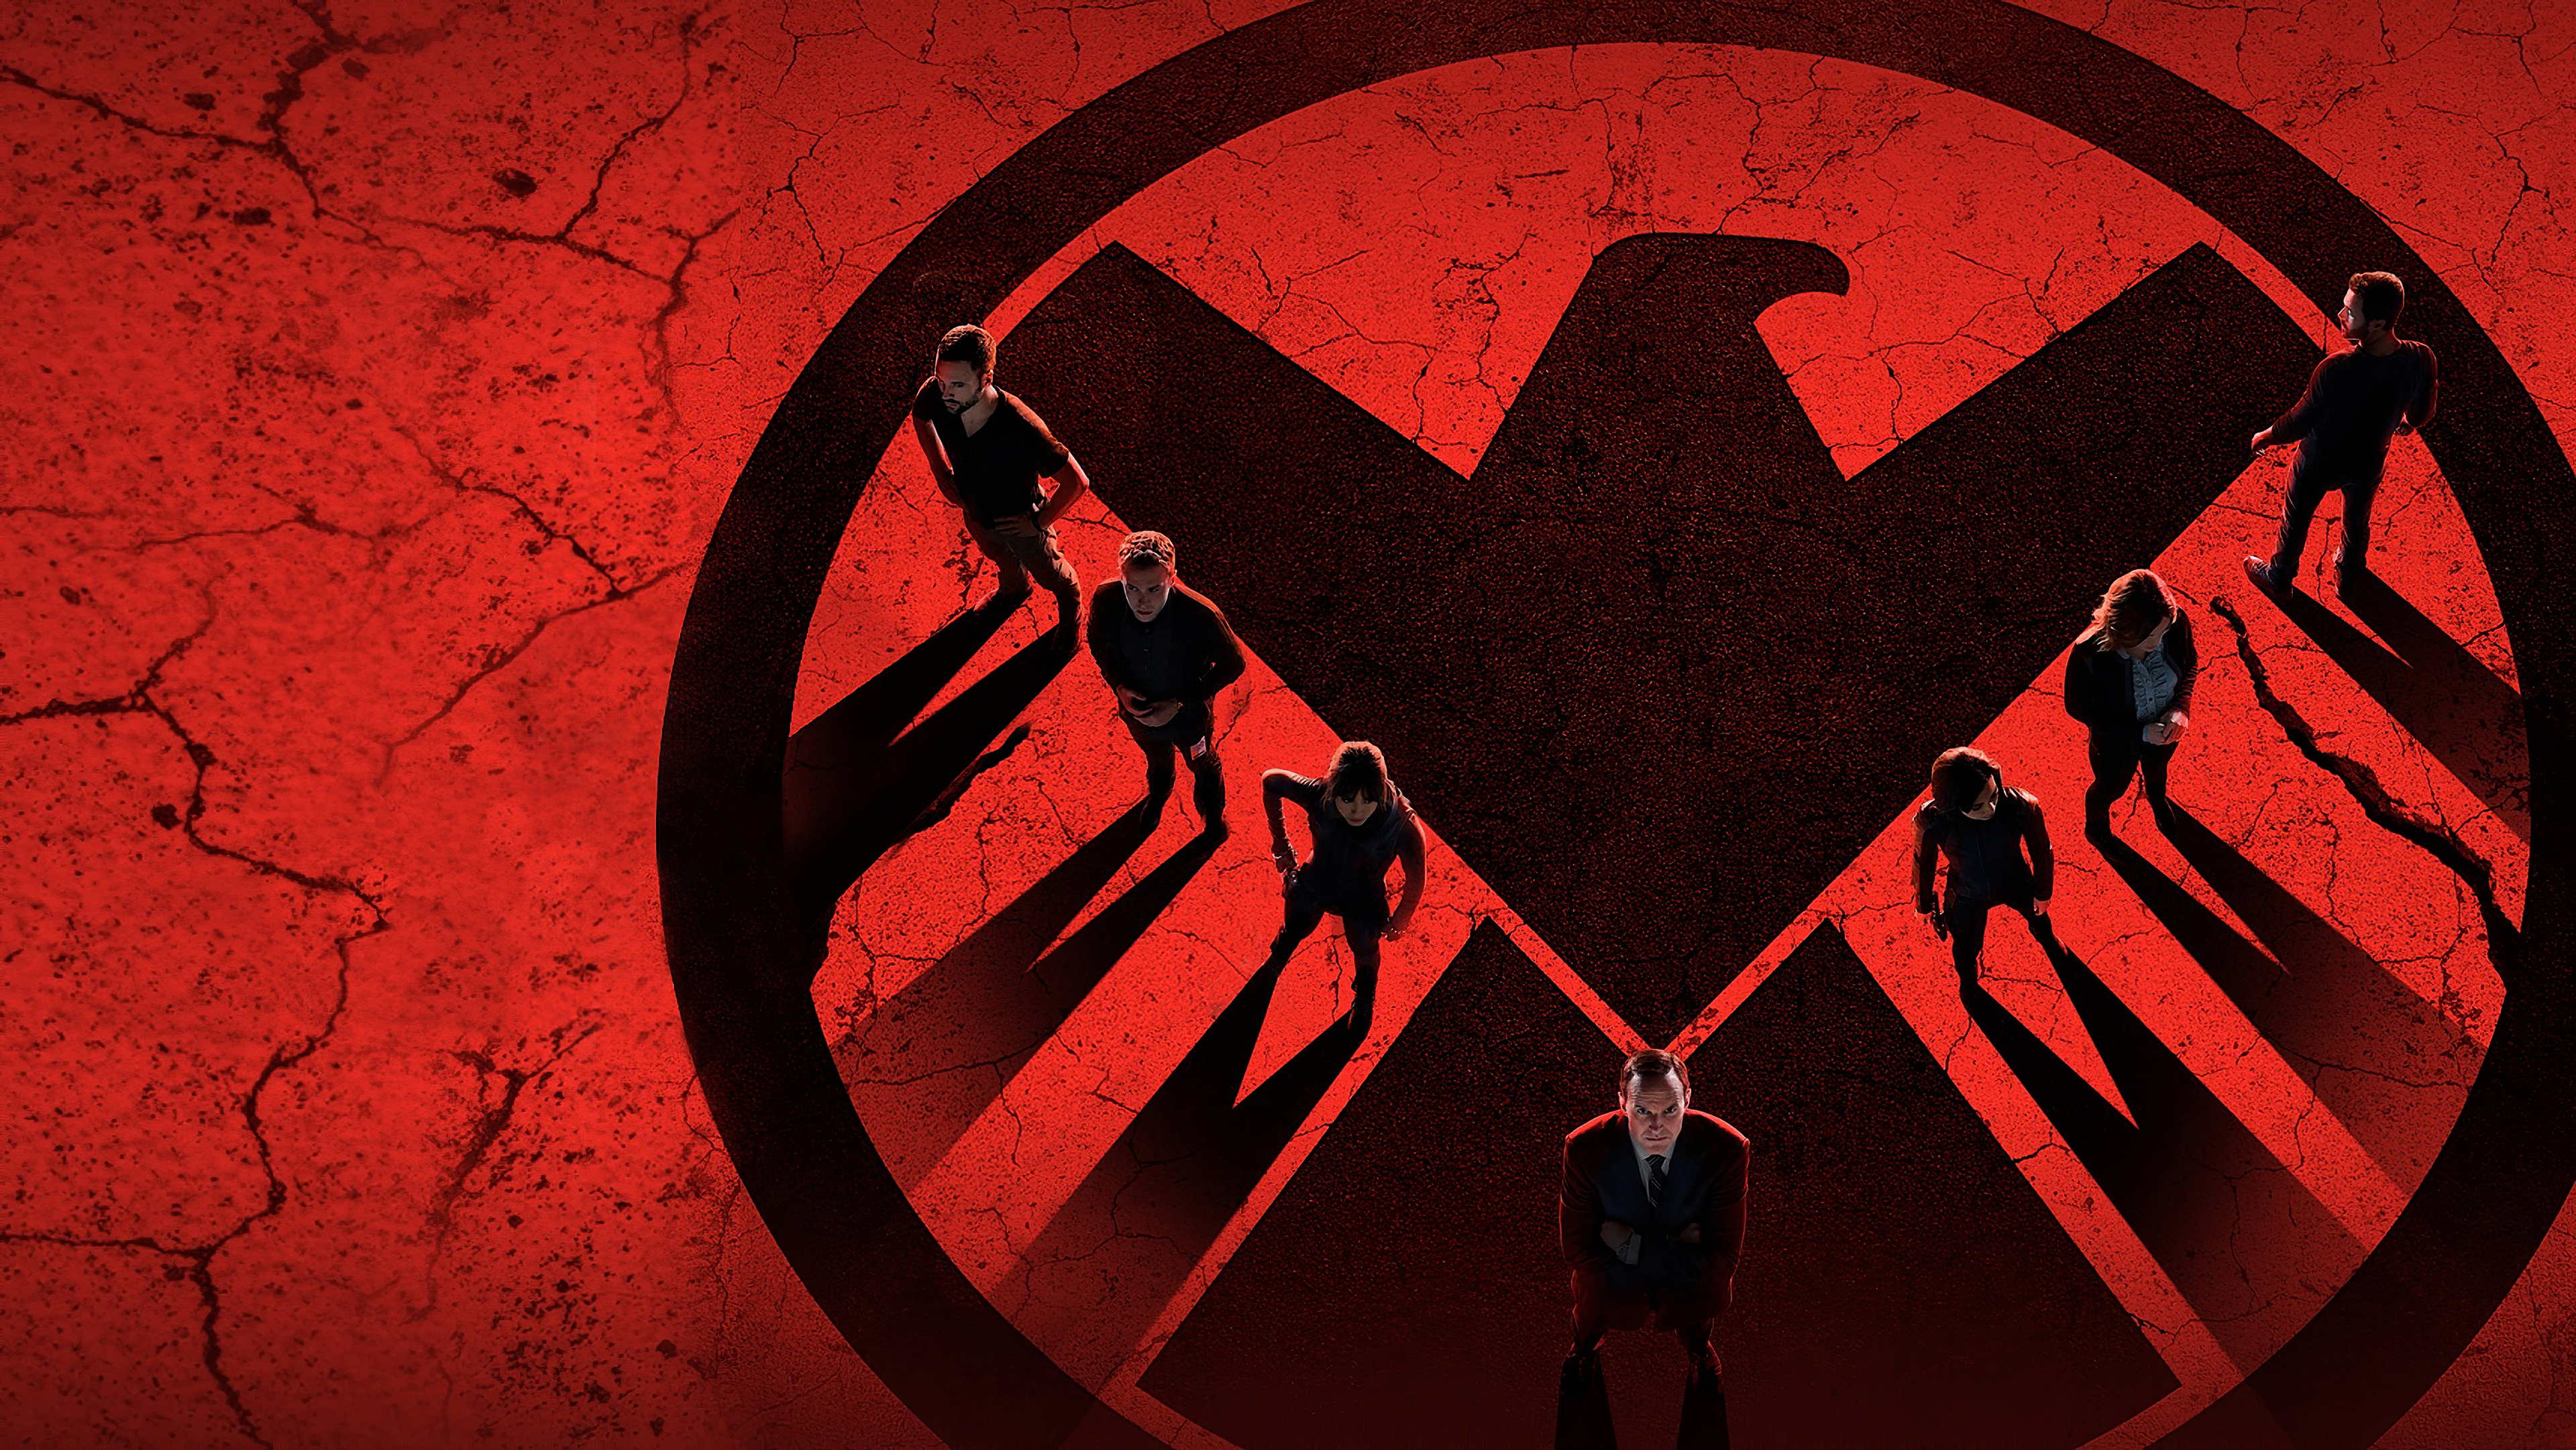 Marvel S Agents Of S H I E L D 4k Ultra Hd Wallpaper Background